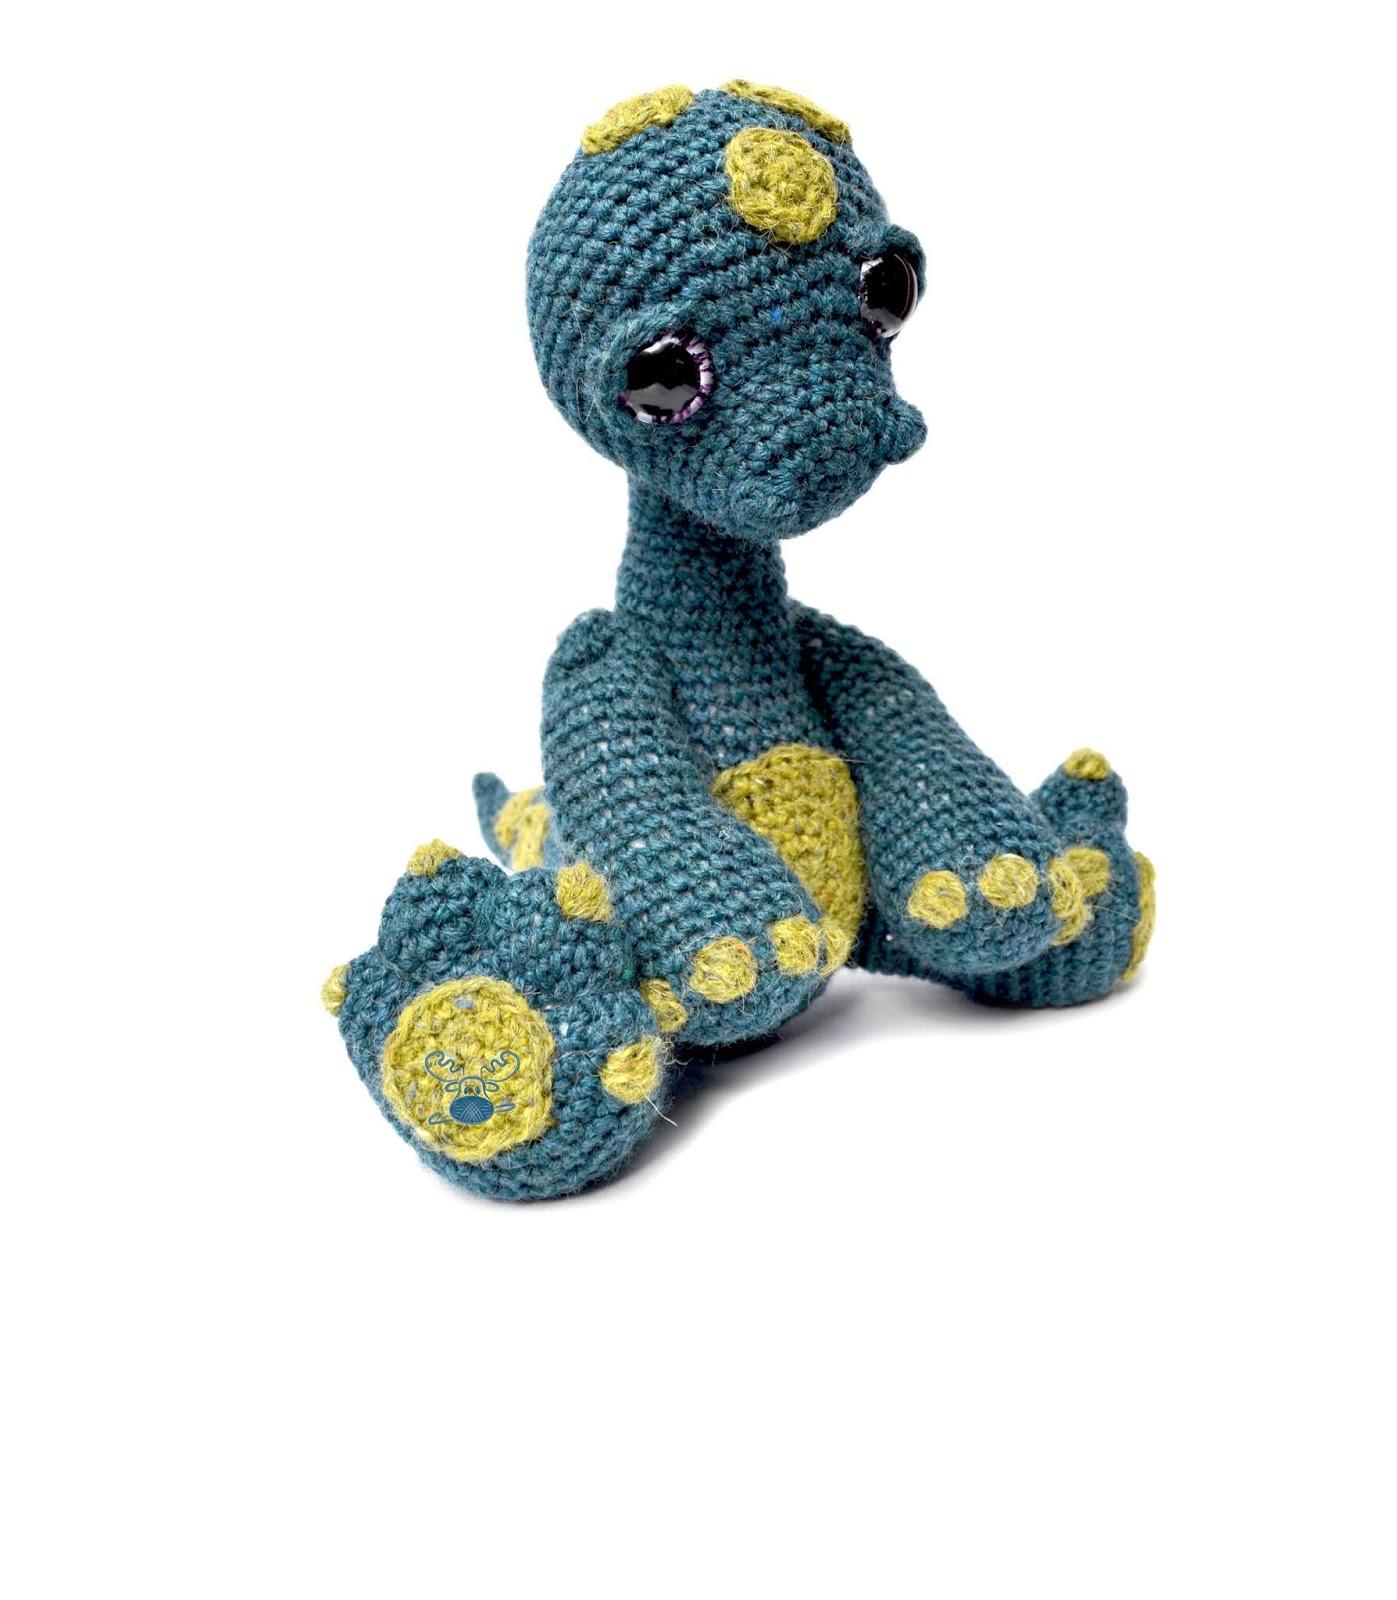 Nessie the Loch Ness Monster Crochet Pattern PDF | Patchwork Moose | 1600x1397